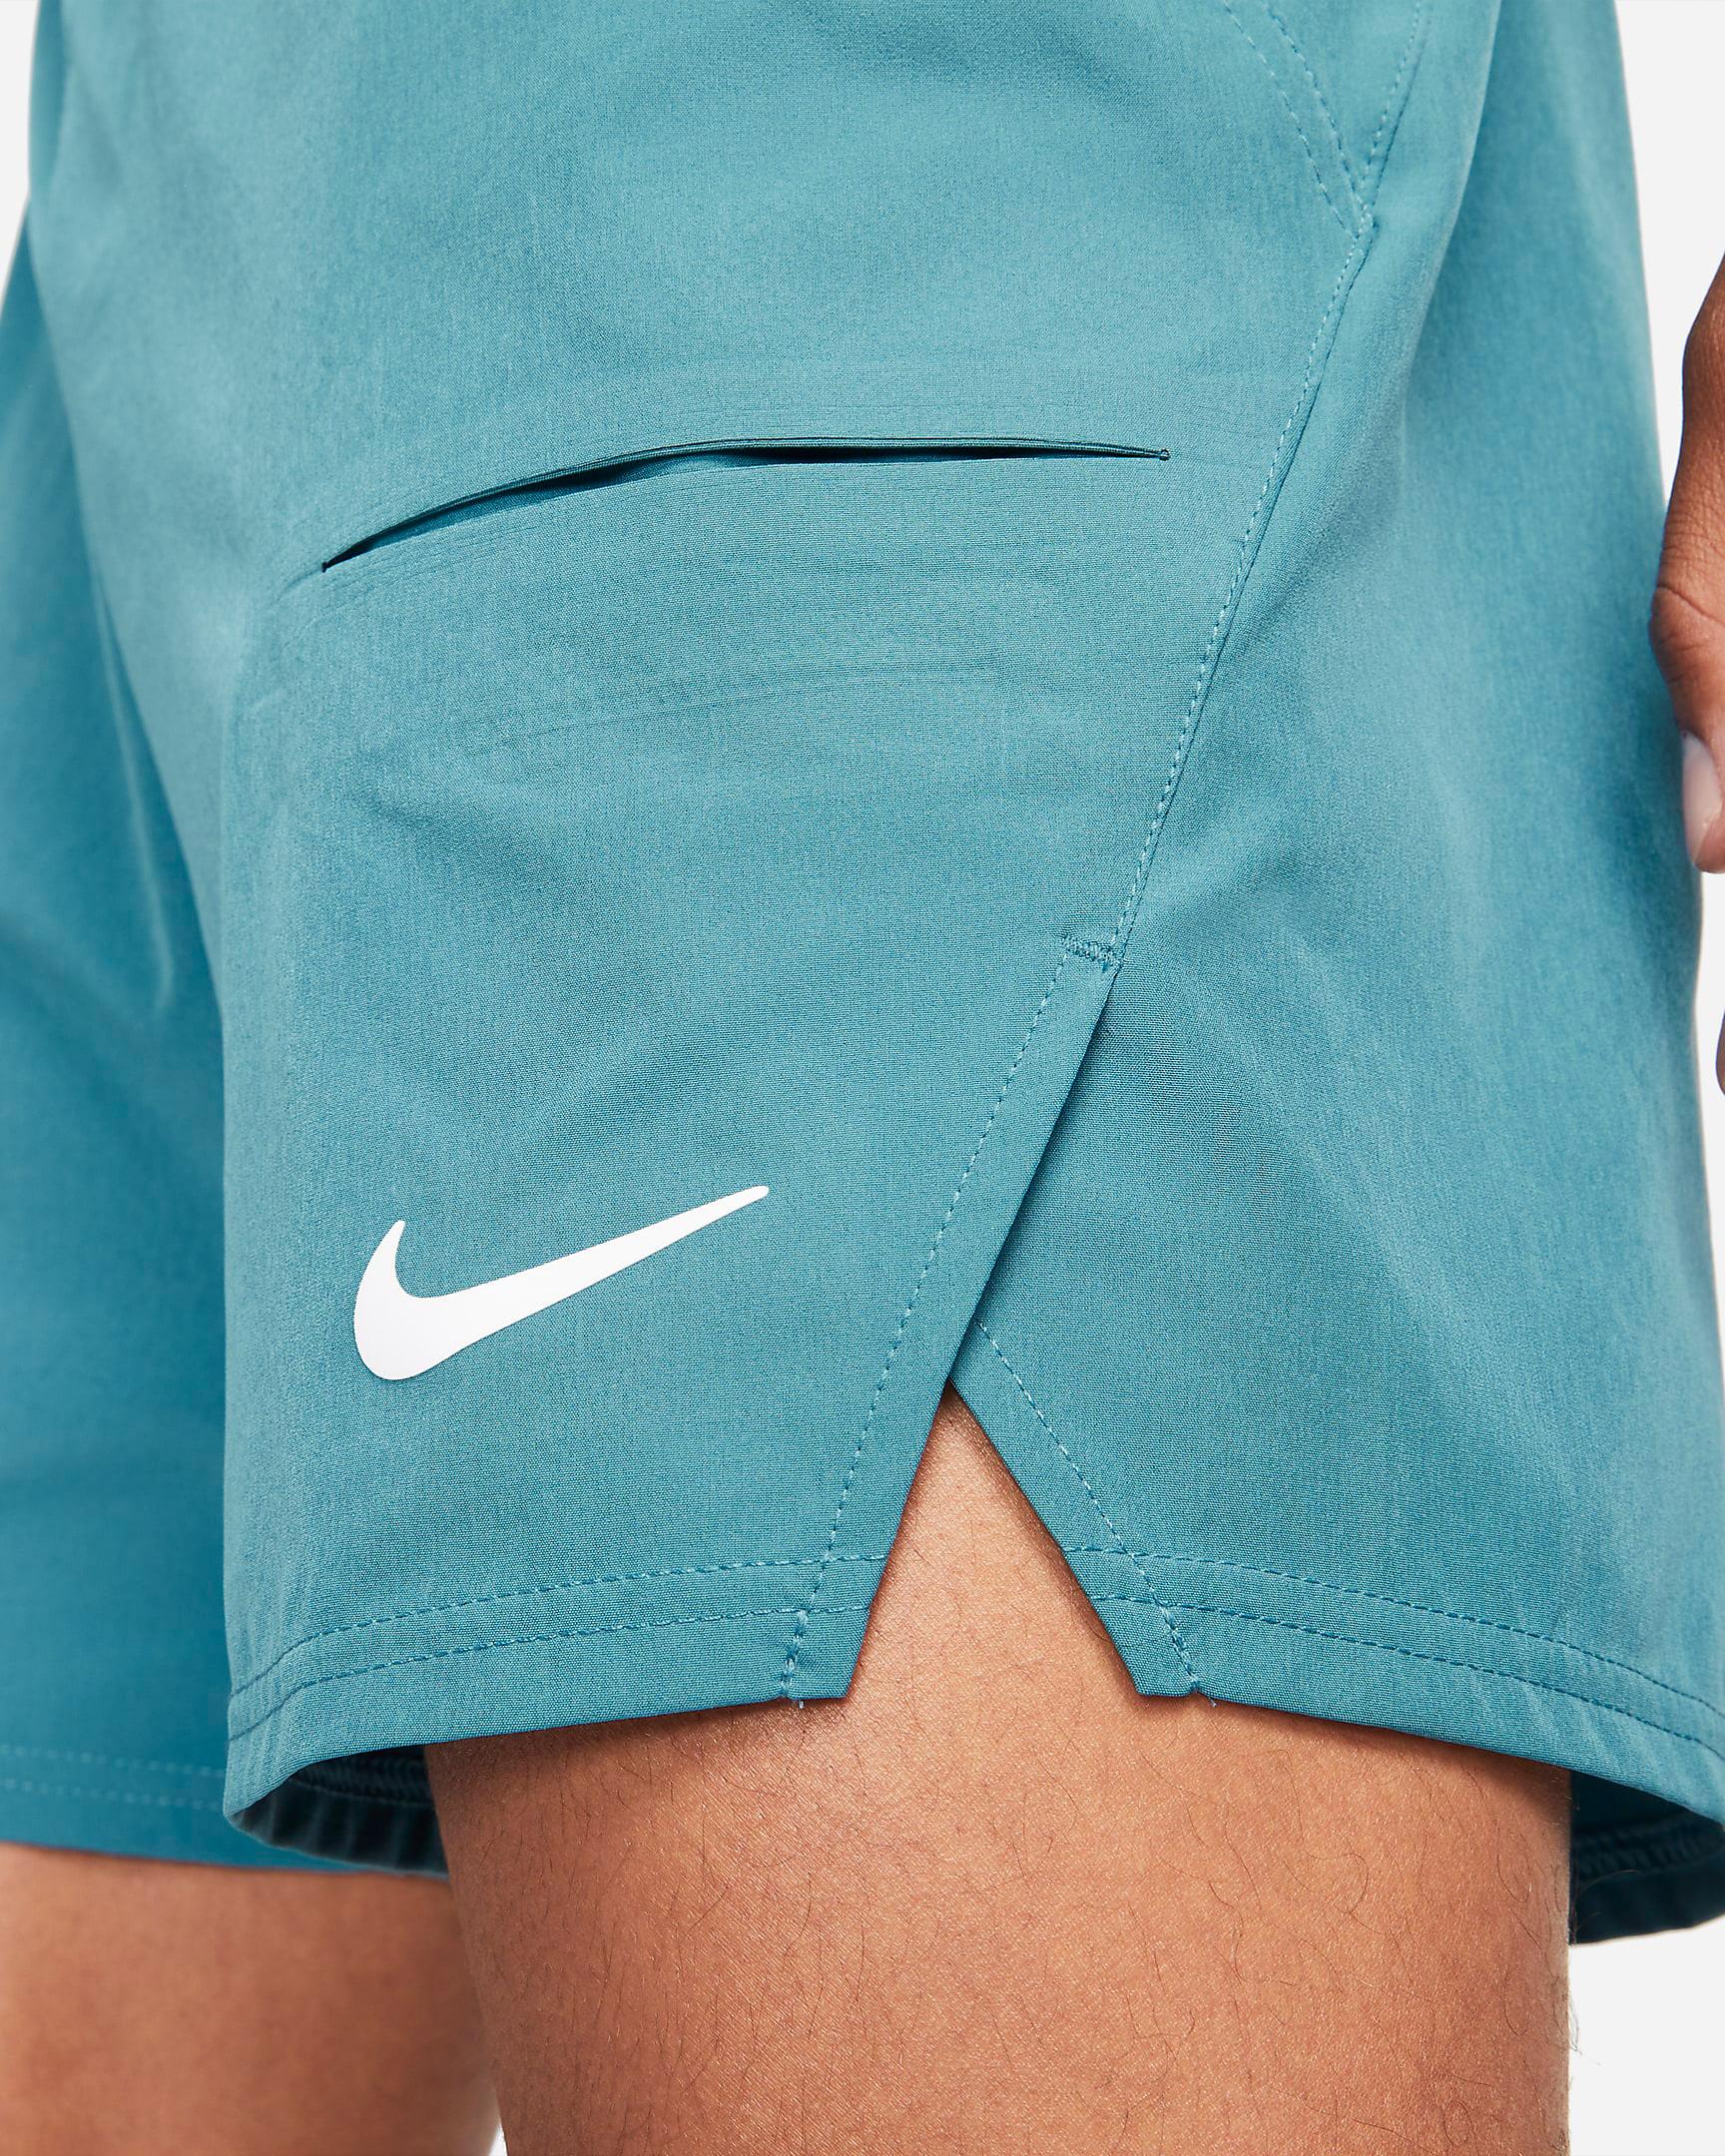 nike-rift-blue-tennis-shirt-shorts-3